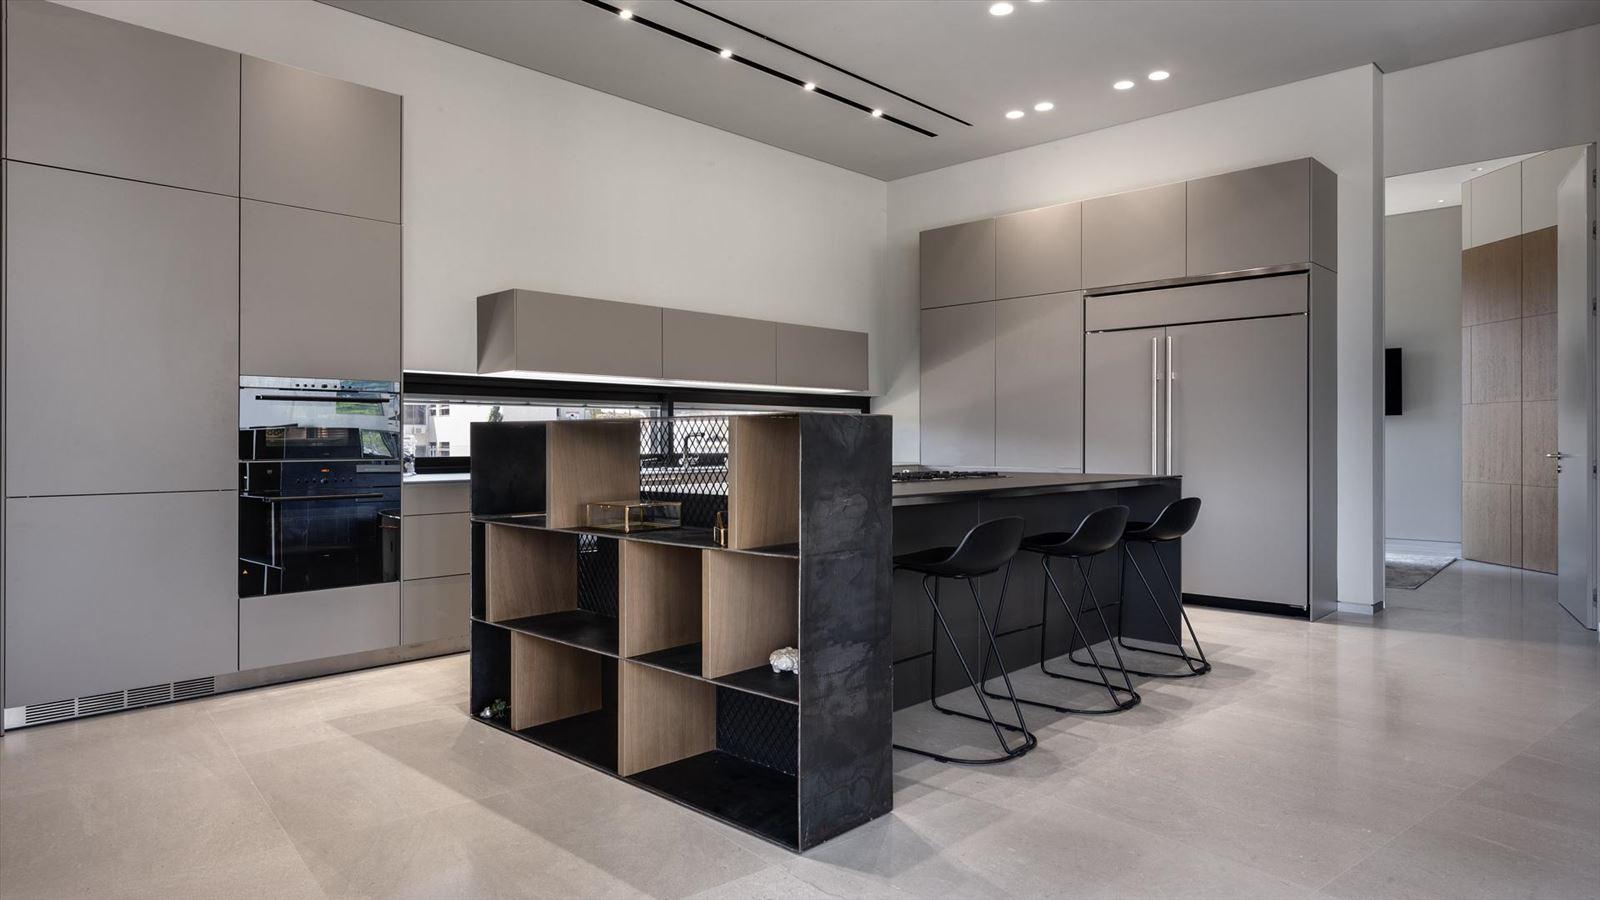 CENTRAL TLV LOFT גופי תאורה מאירים את שטח המטבח בעיצוב קמחי תאורה